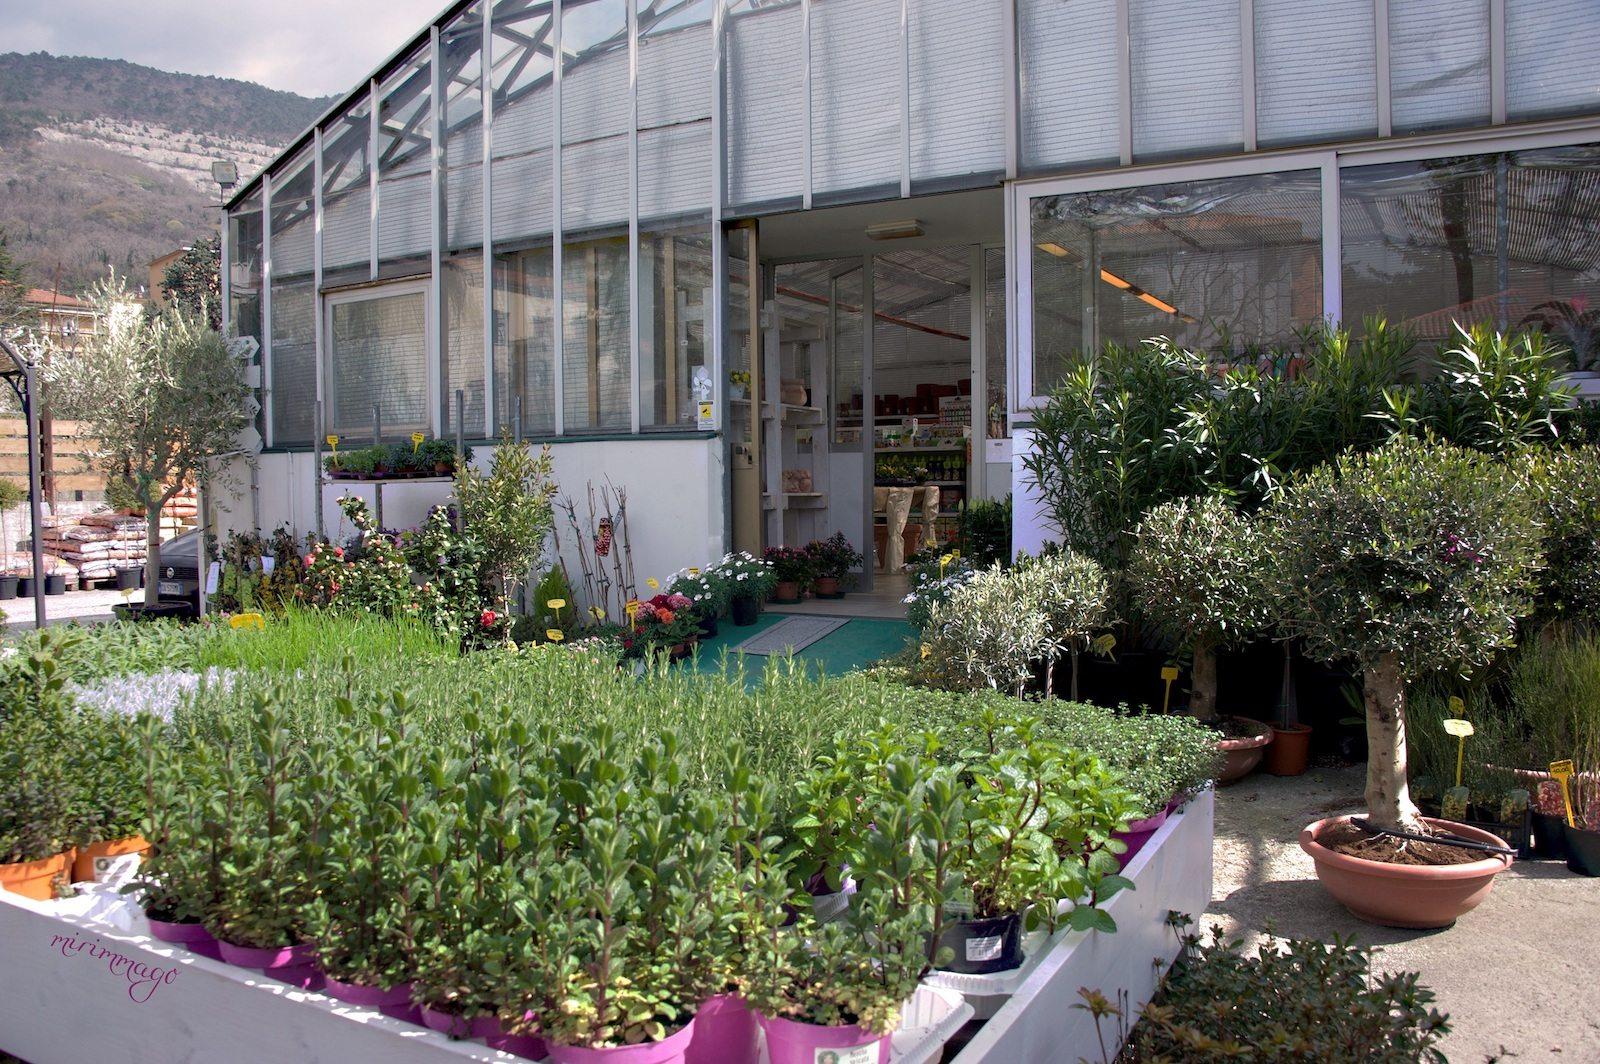 Vasi Per Piante Da Terrazzo piante, idee regalo, giardinaggio | biogeste vivai